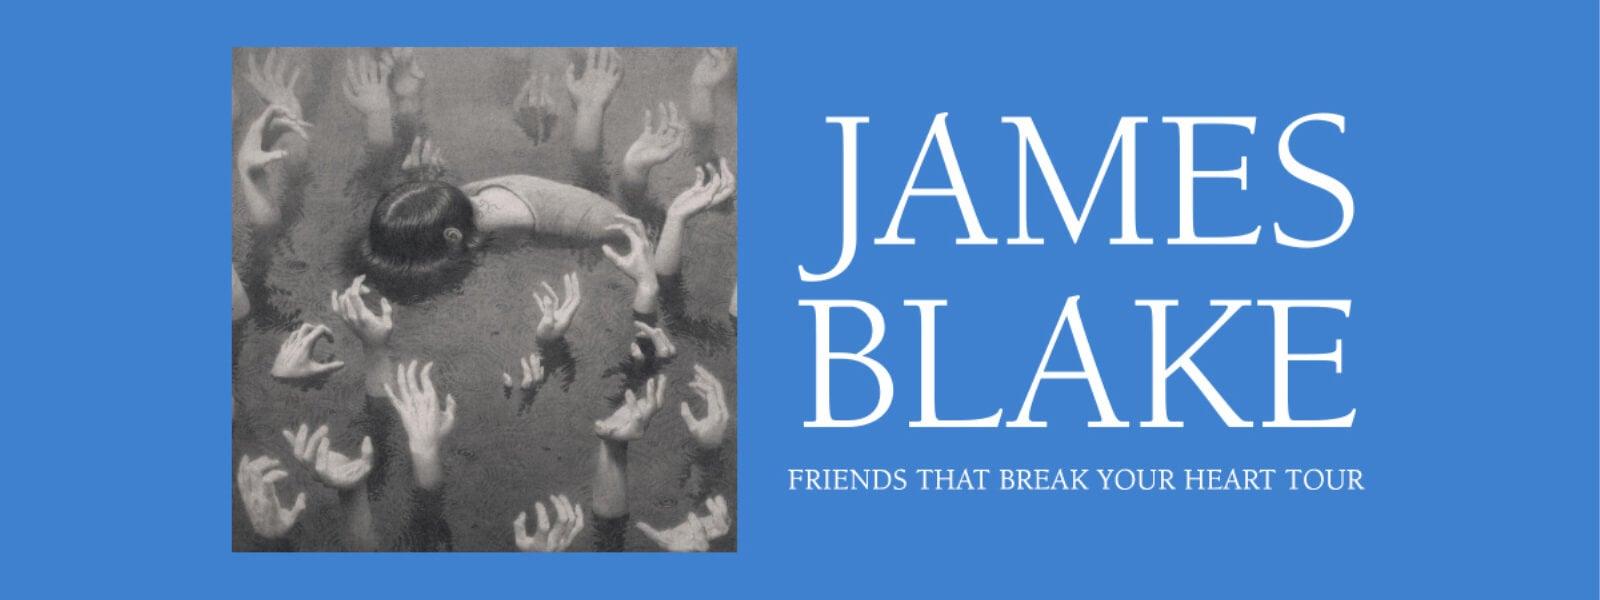 James Blake: Friends That Break Your Heart Tour